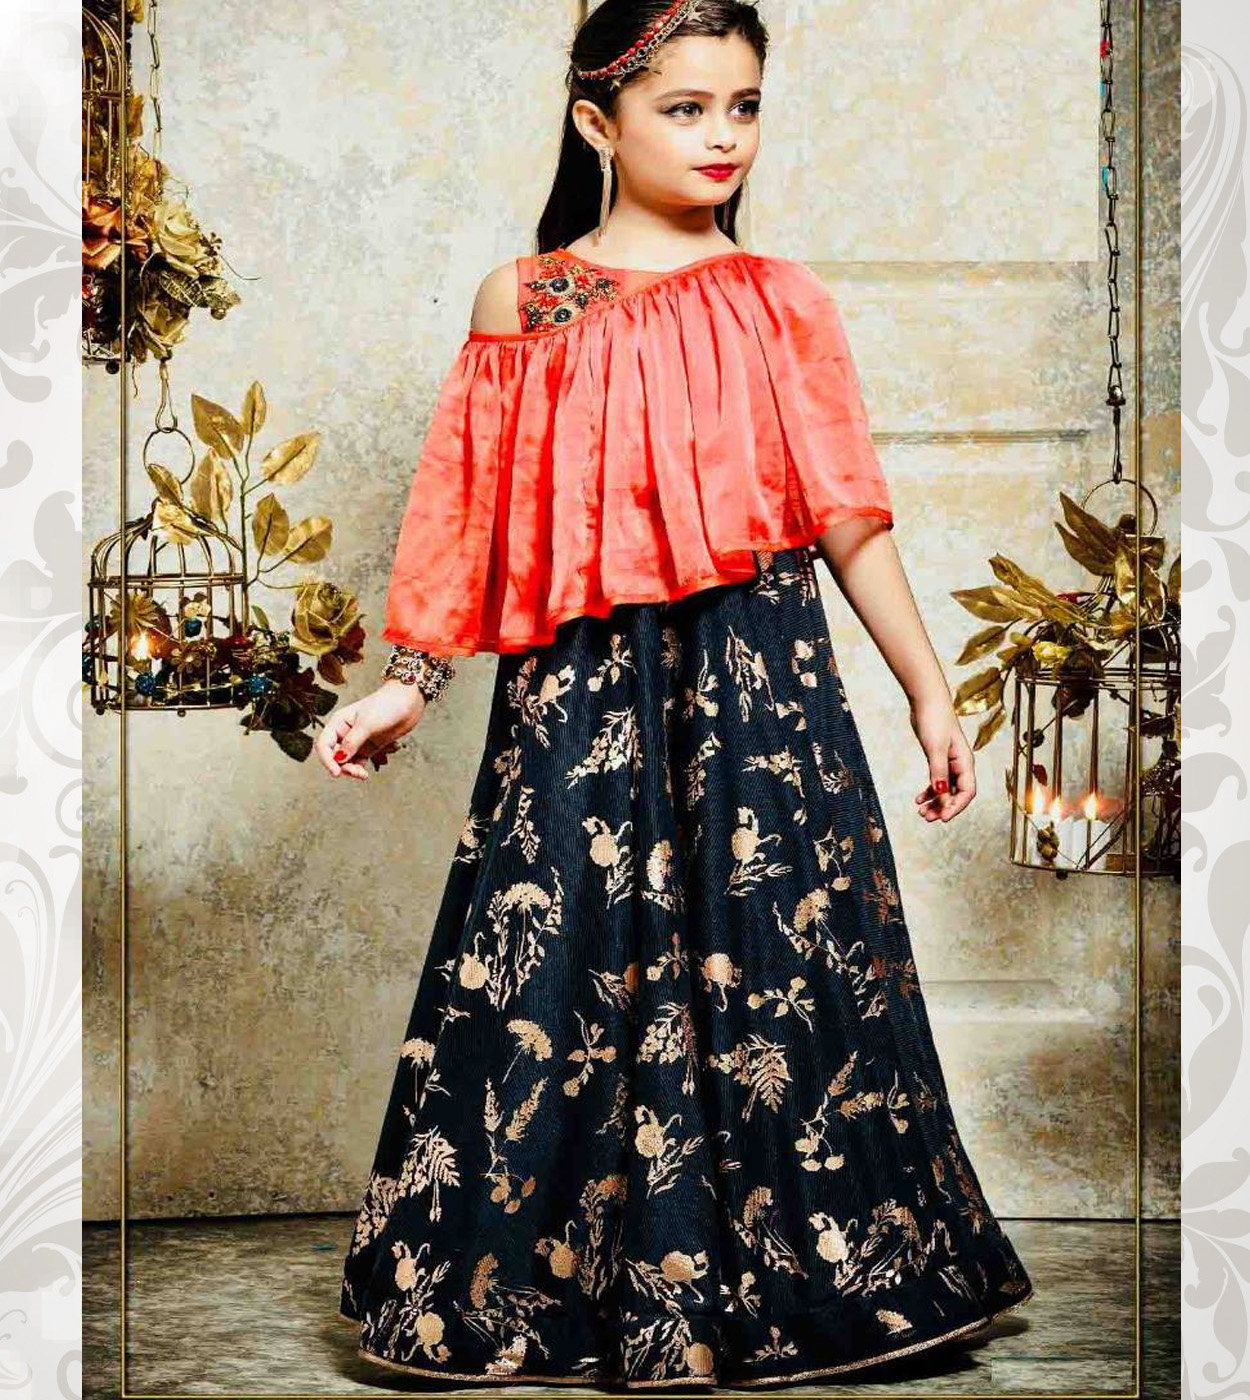 Pretty Designer Kids Wear Jodhpurigalax,Living Room Bedroom Home Furniture Design